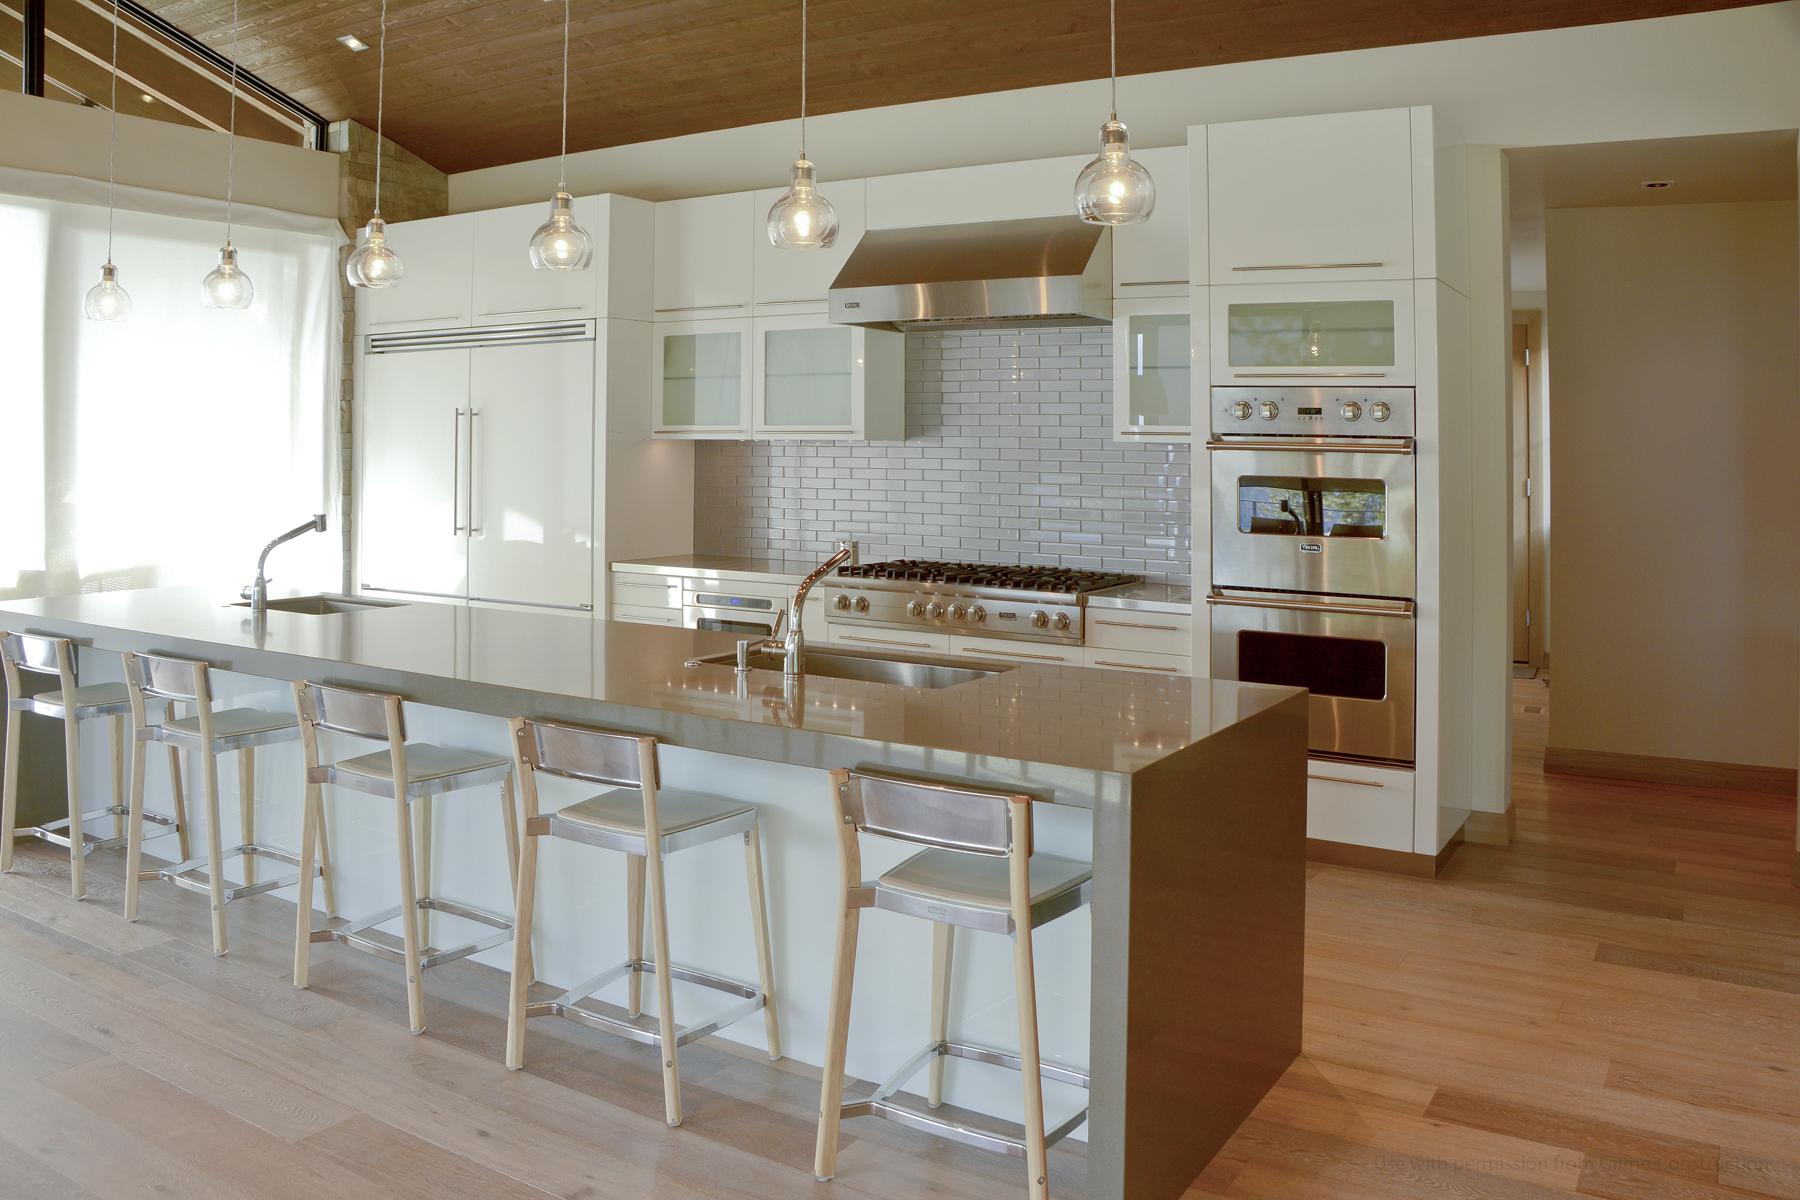 Custom Home at Black Rock by Matt Fisher, GC of Shelter Associates